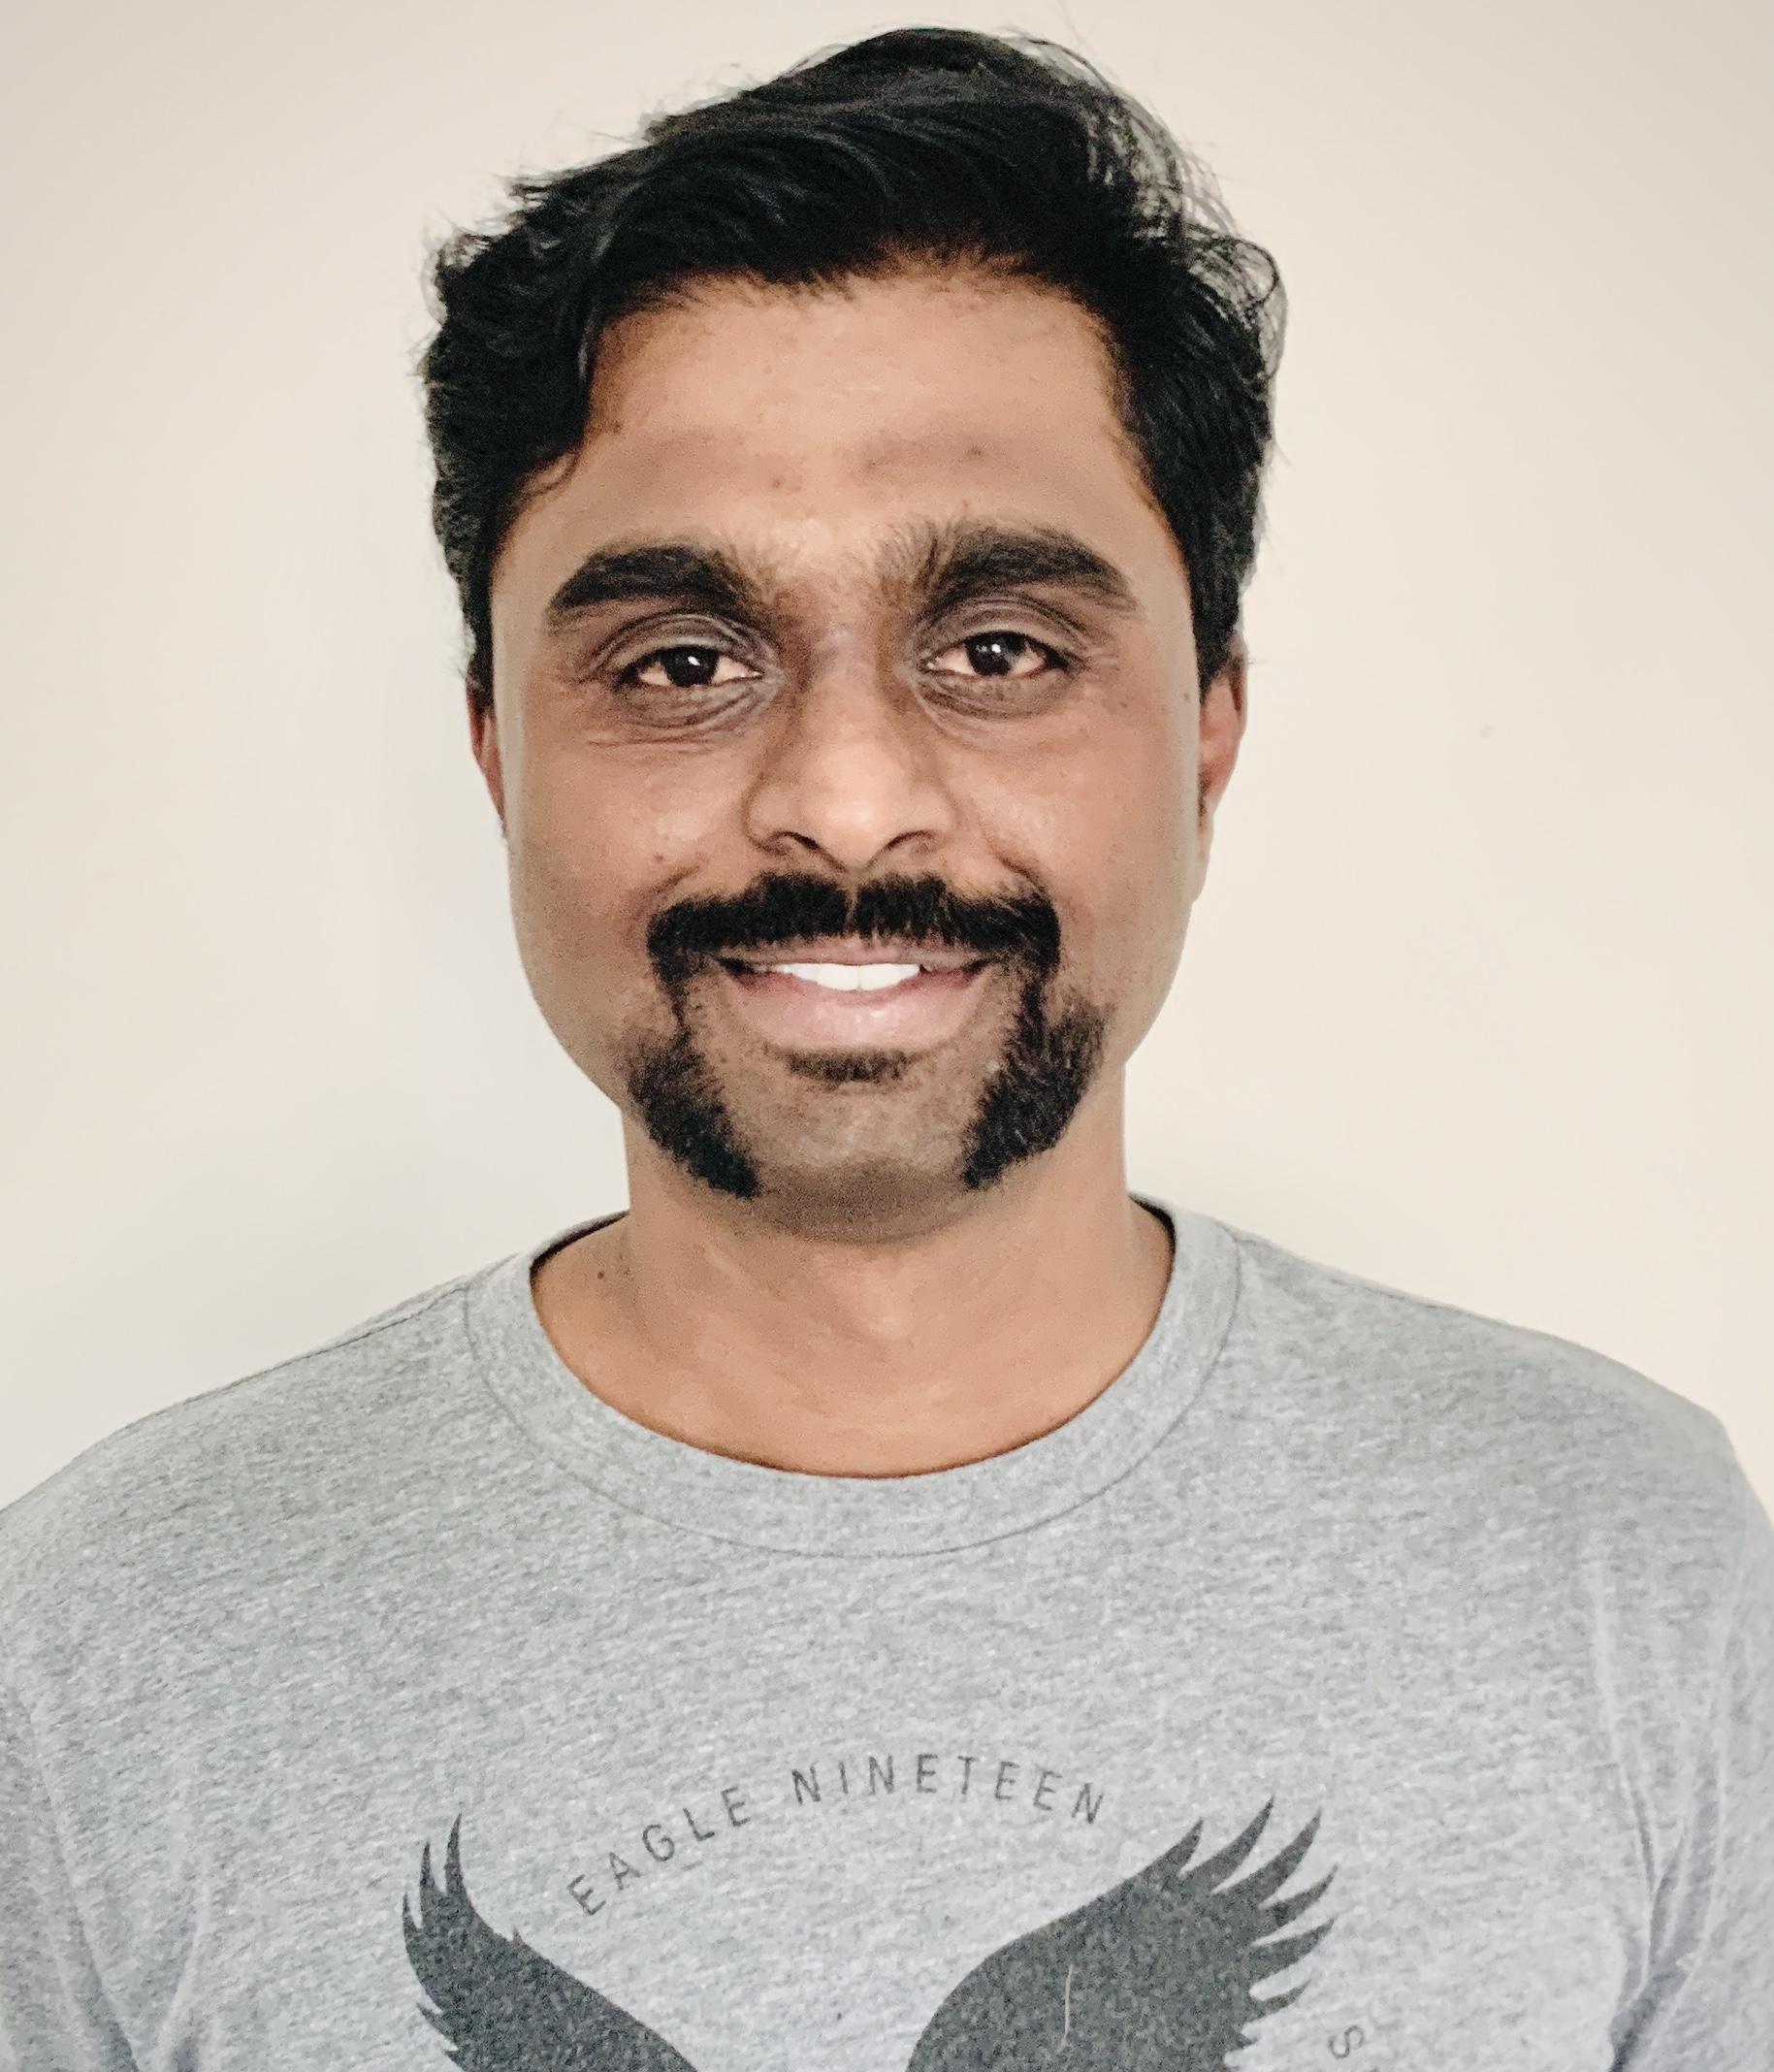 Imaya Kumar Jagannathan